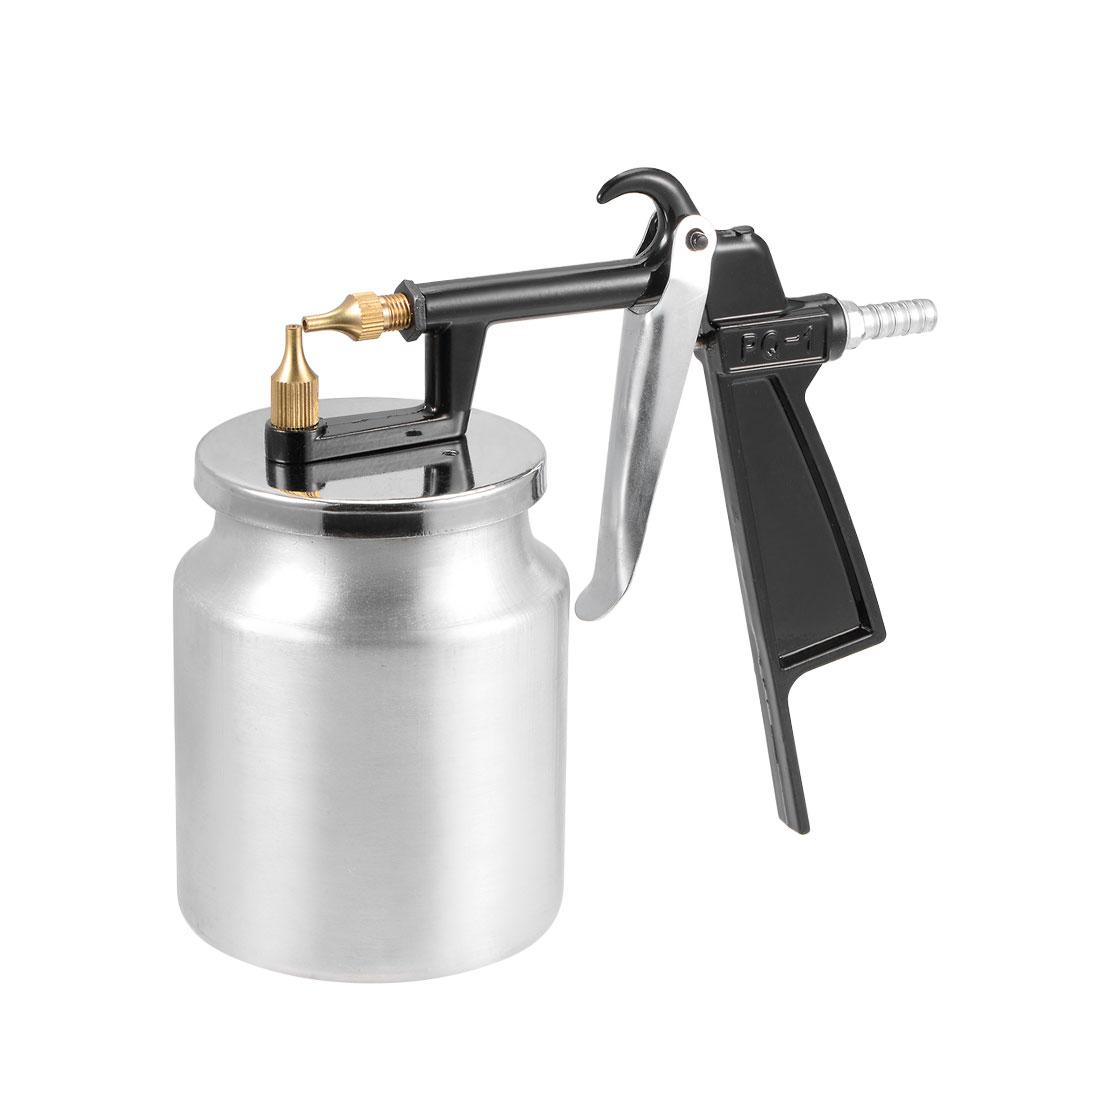 Spray Gun 2mm Nozzle w 400cc Cup HVLP Siphon Feed Paint Tool Kit Aluminium Alloy